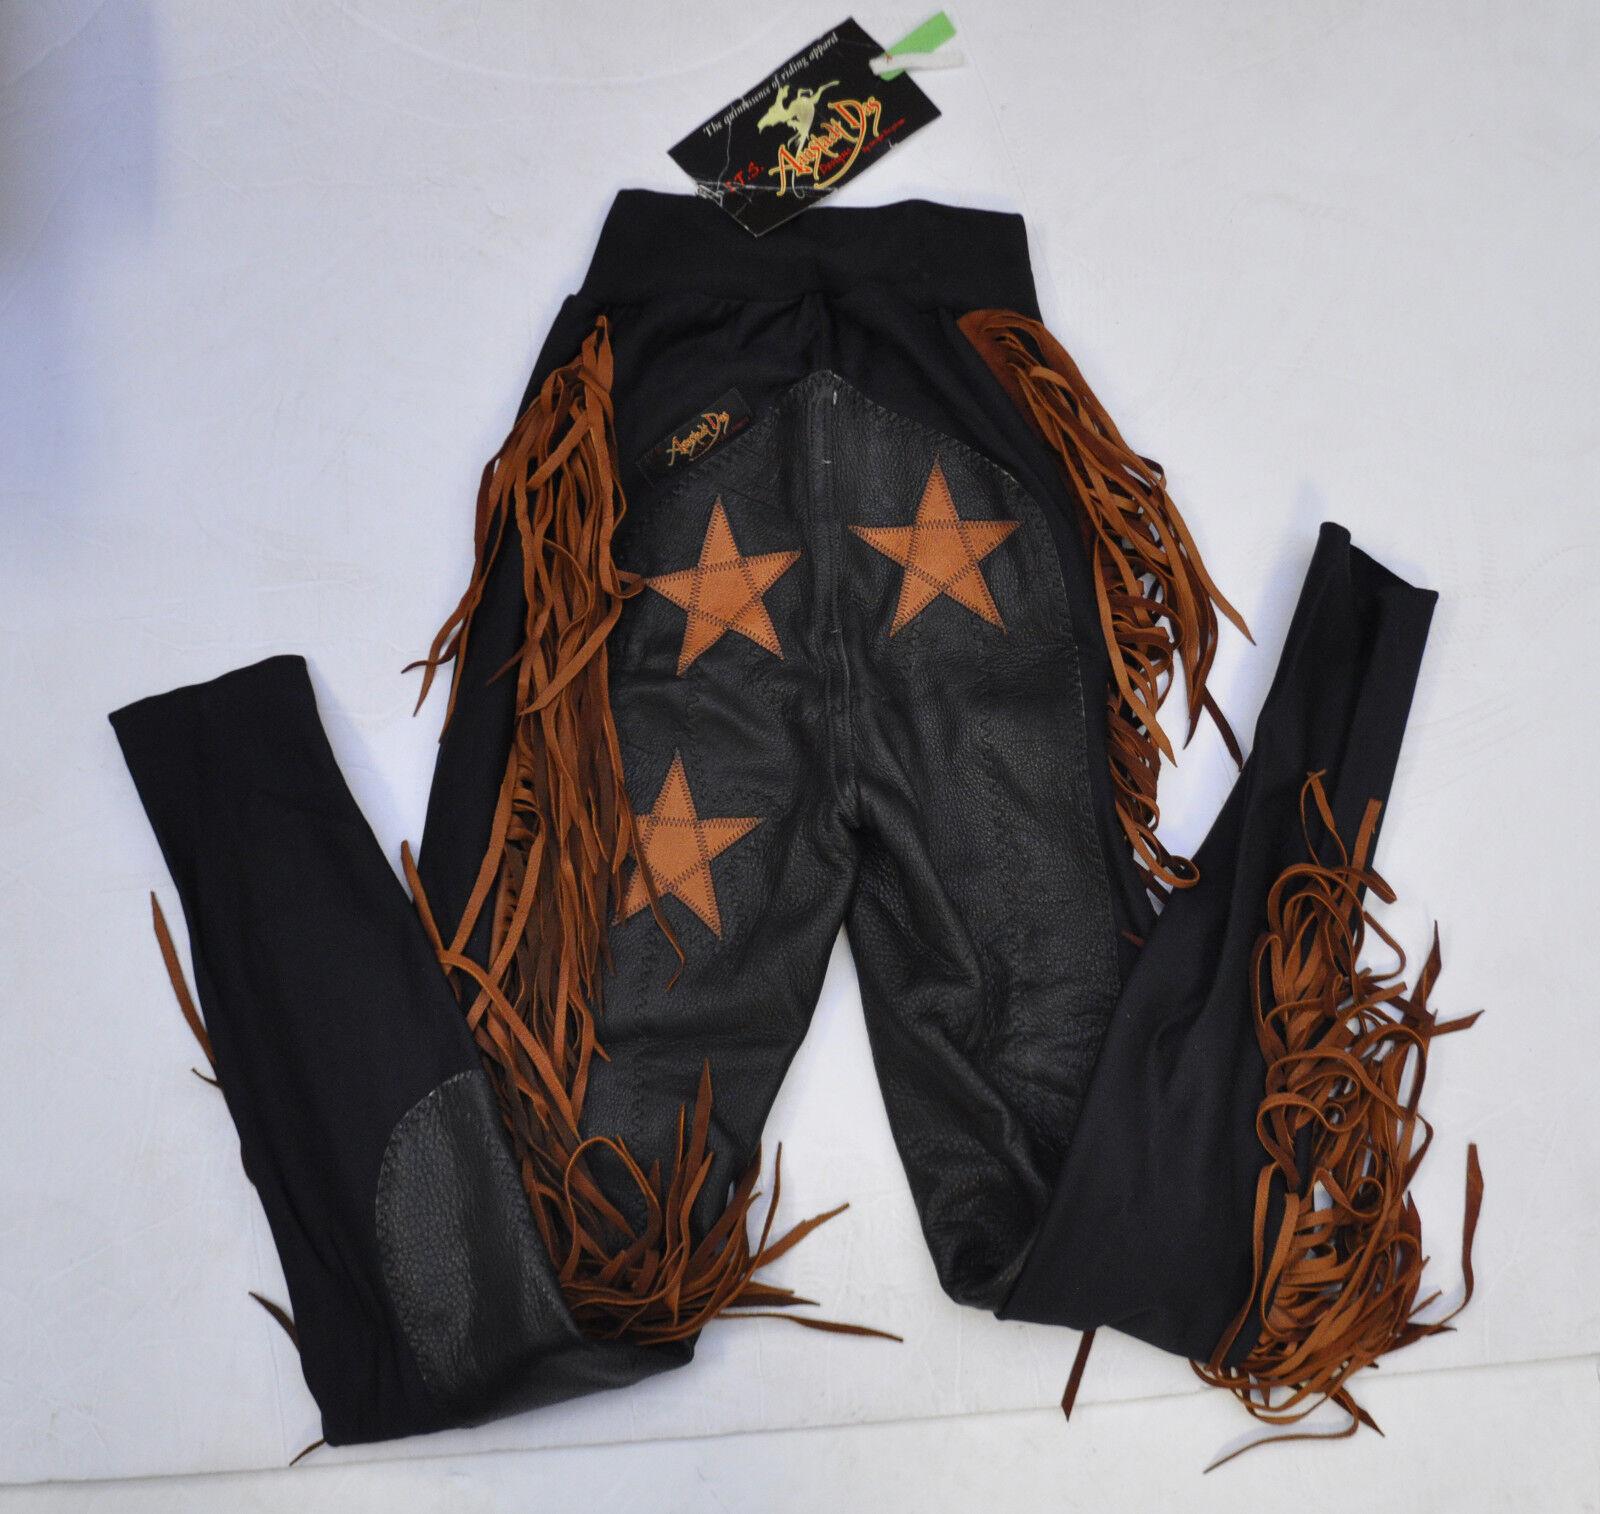 Aanstadt das Deerskin Completo  Asiento Equitación Pantalones de Montar W Flecos Negro AC Talla M  exclusivo